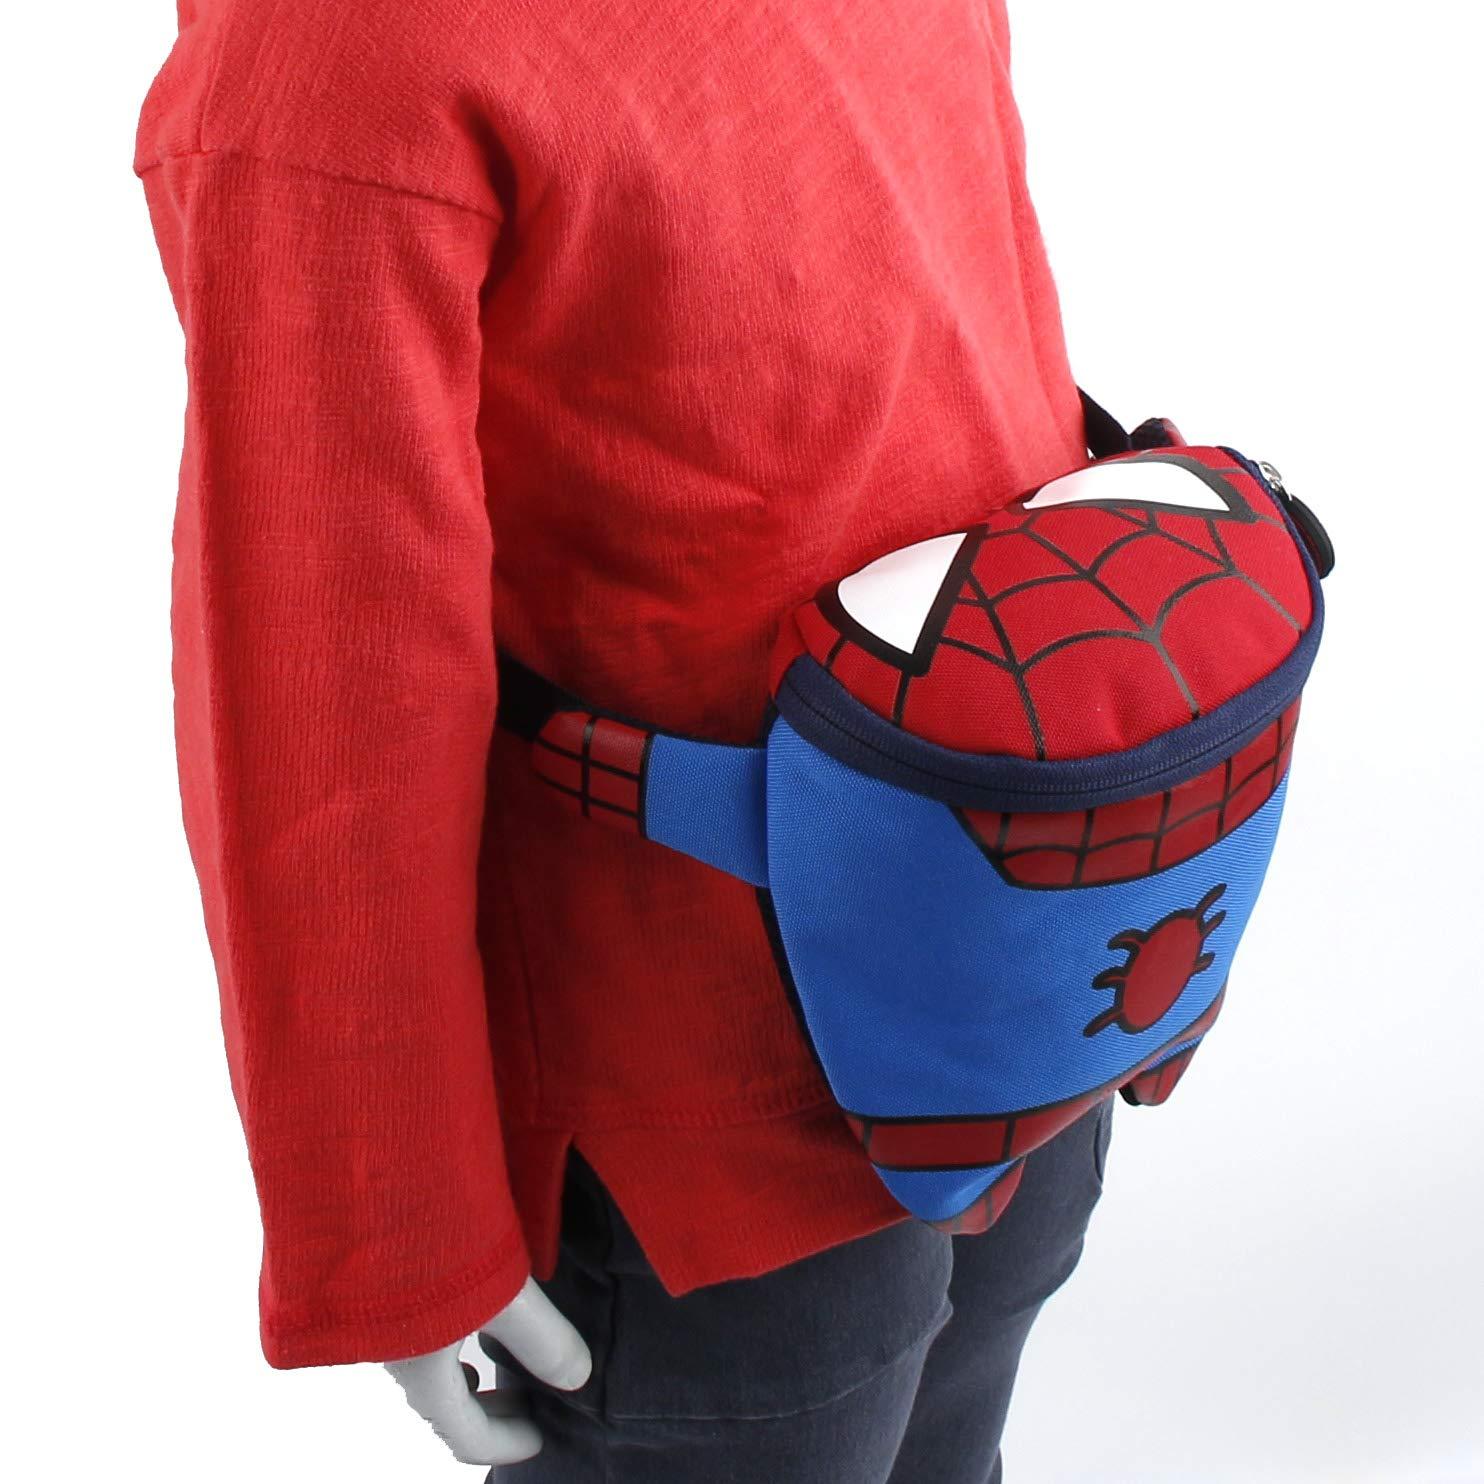 3~5ages Disney MARVEL Spider Man Small HipSack Waist Pack Fanny Bag Phone Wallet for Toddler to Kids